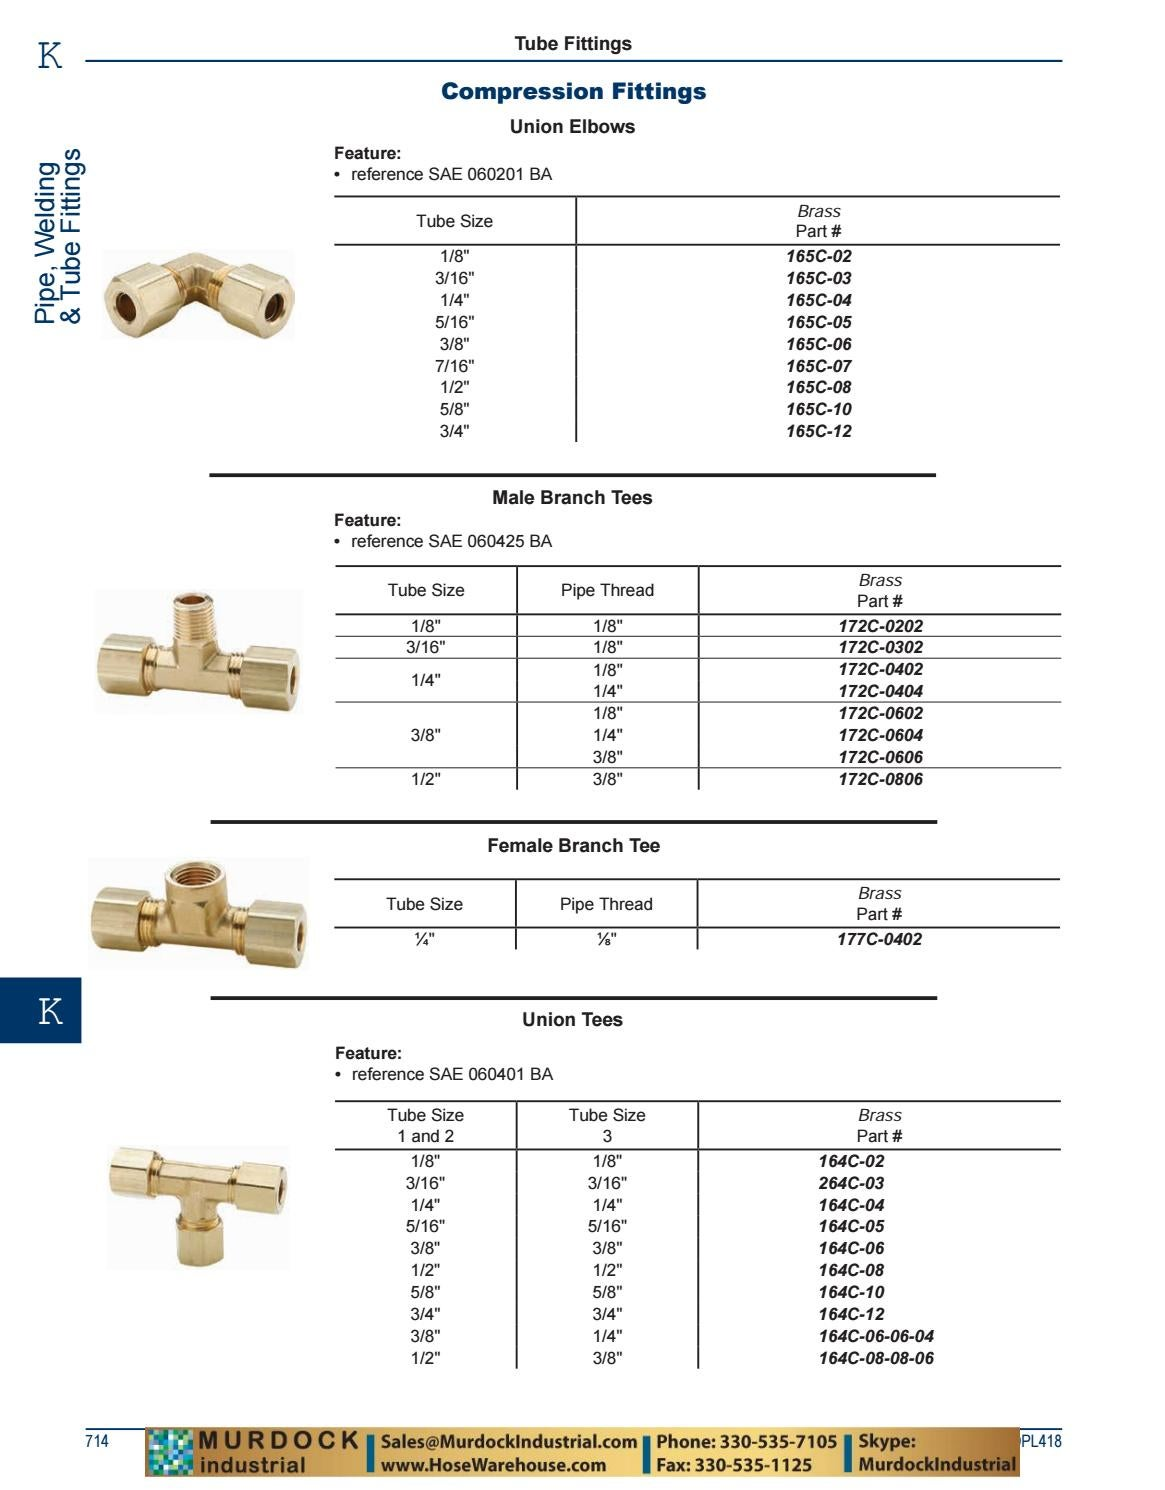 Dixon 3//16 Brass Union Elbow Compression Fitting 165C-03